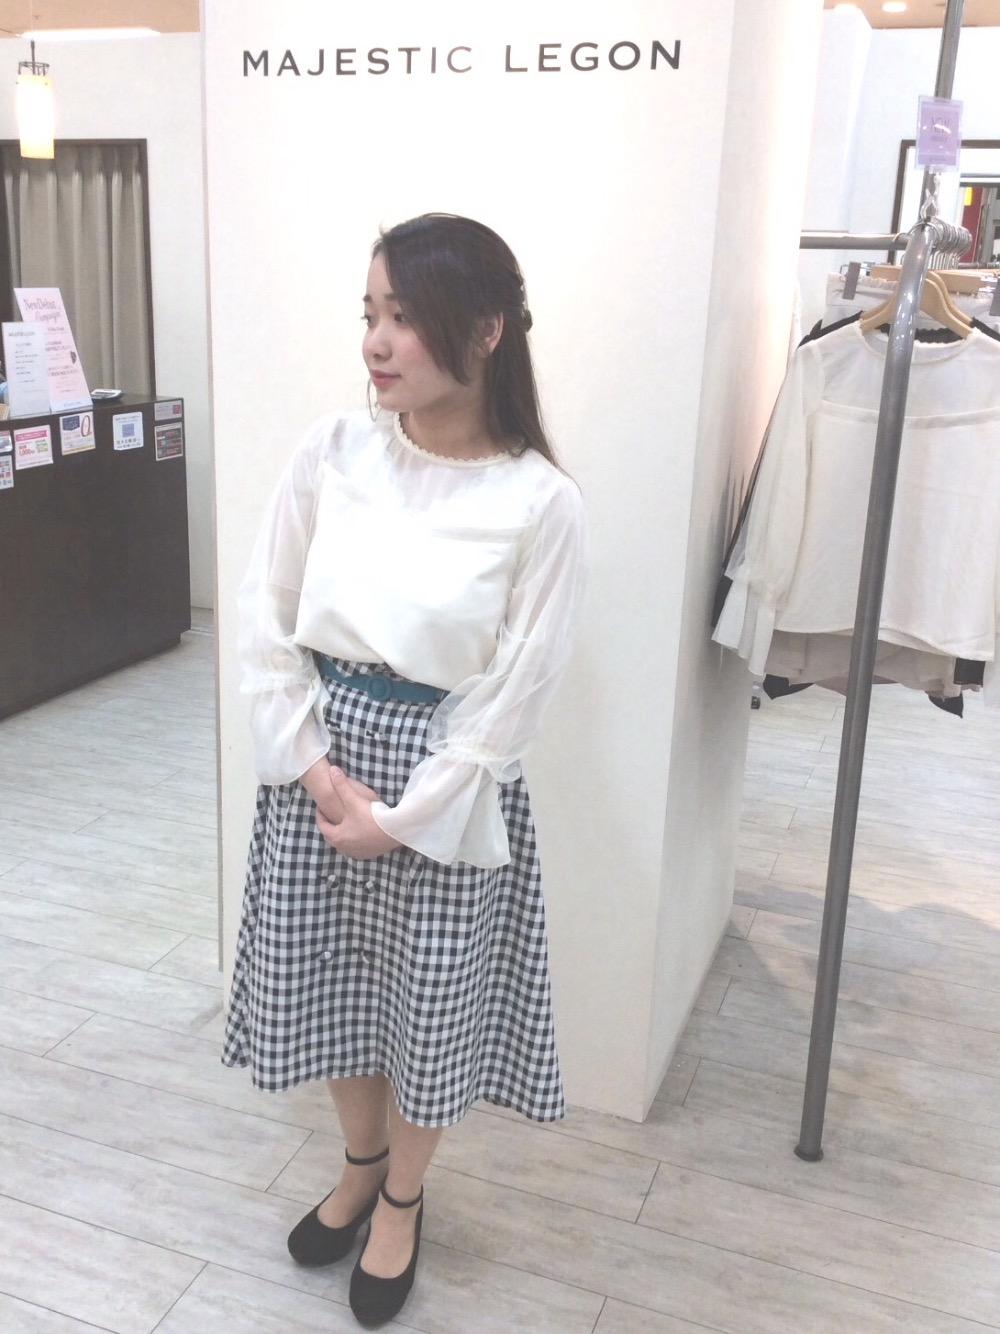 MAJESTIC LEGONイオン釧路店